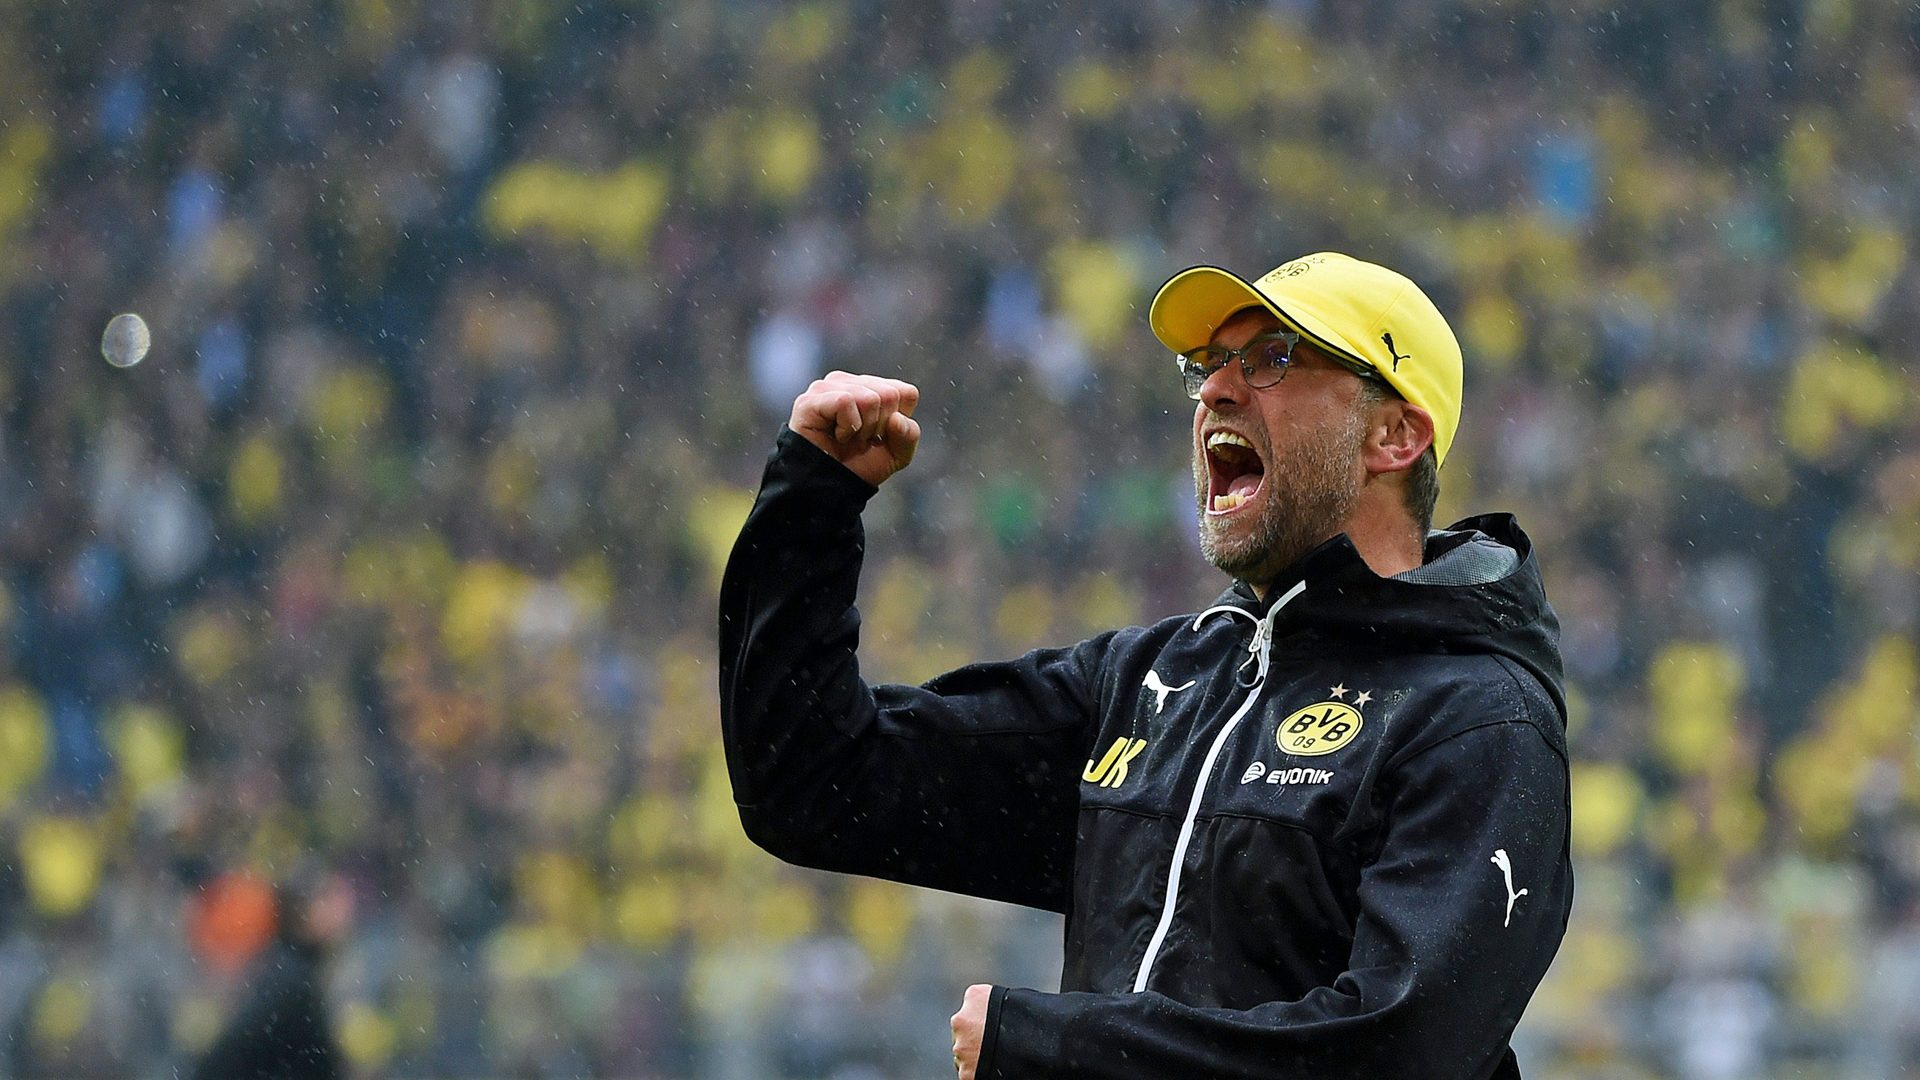 Bundesliga | Jürgen Klopp: A world-class coach, made in the Bundesliga